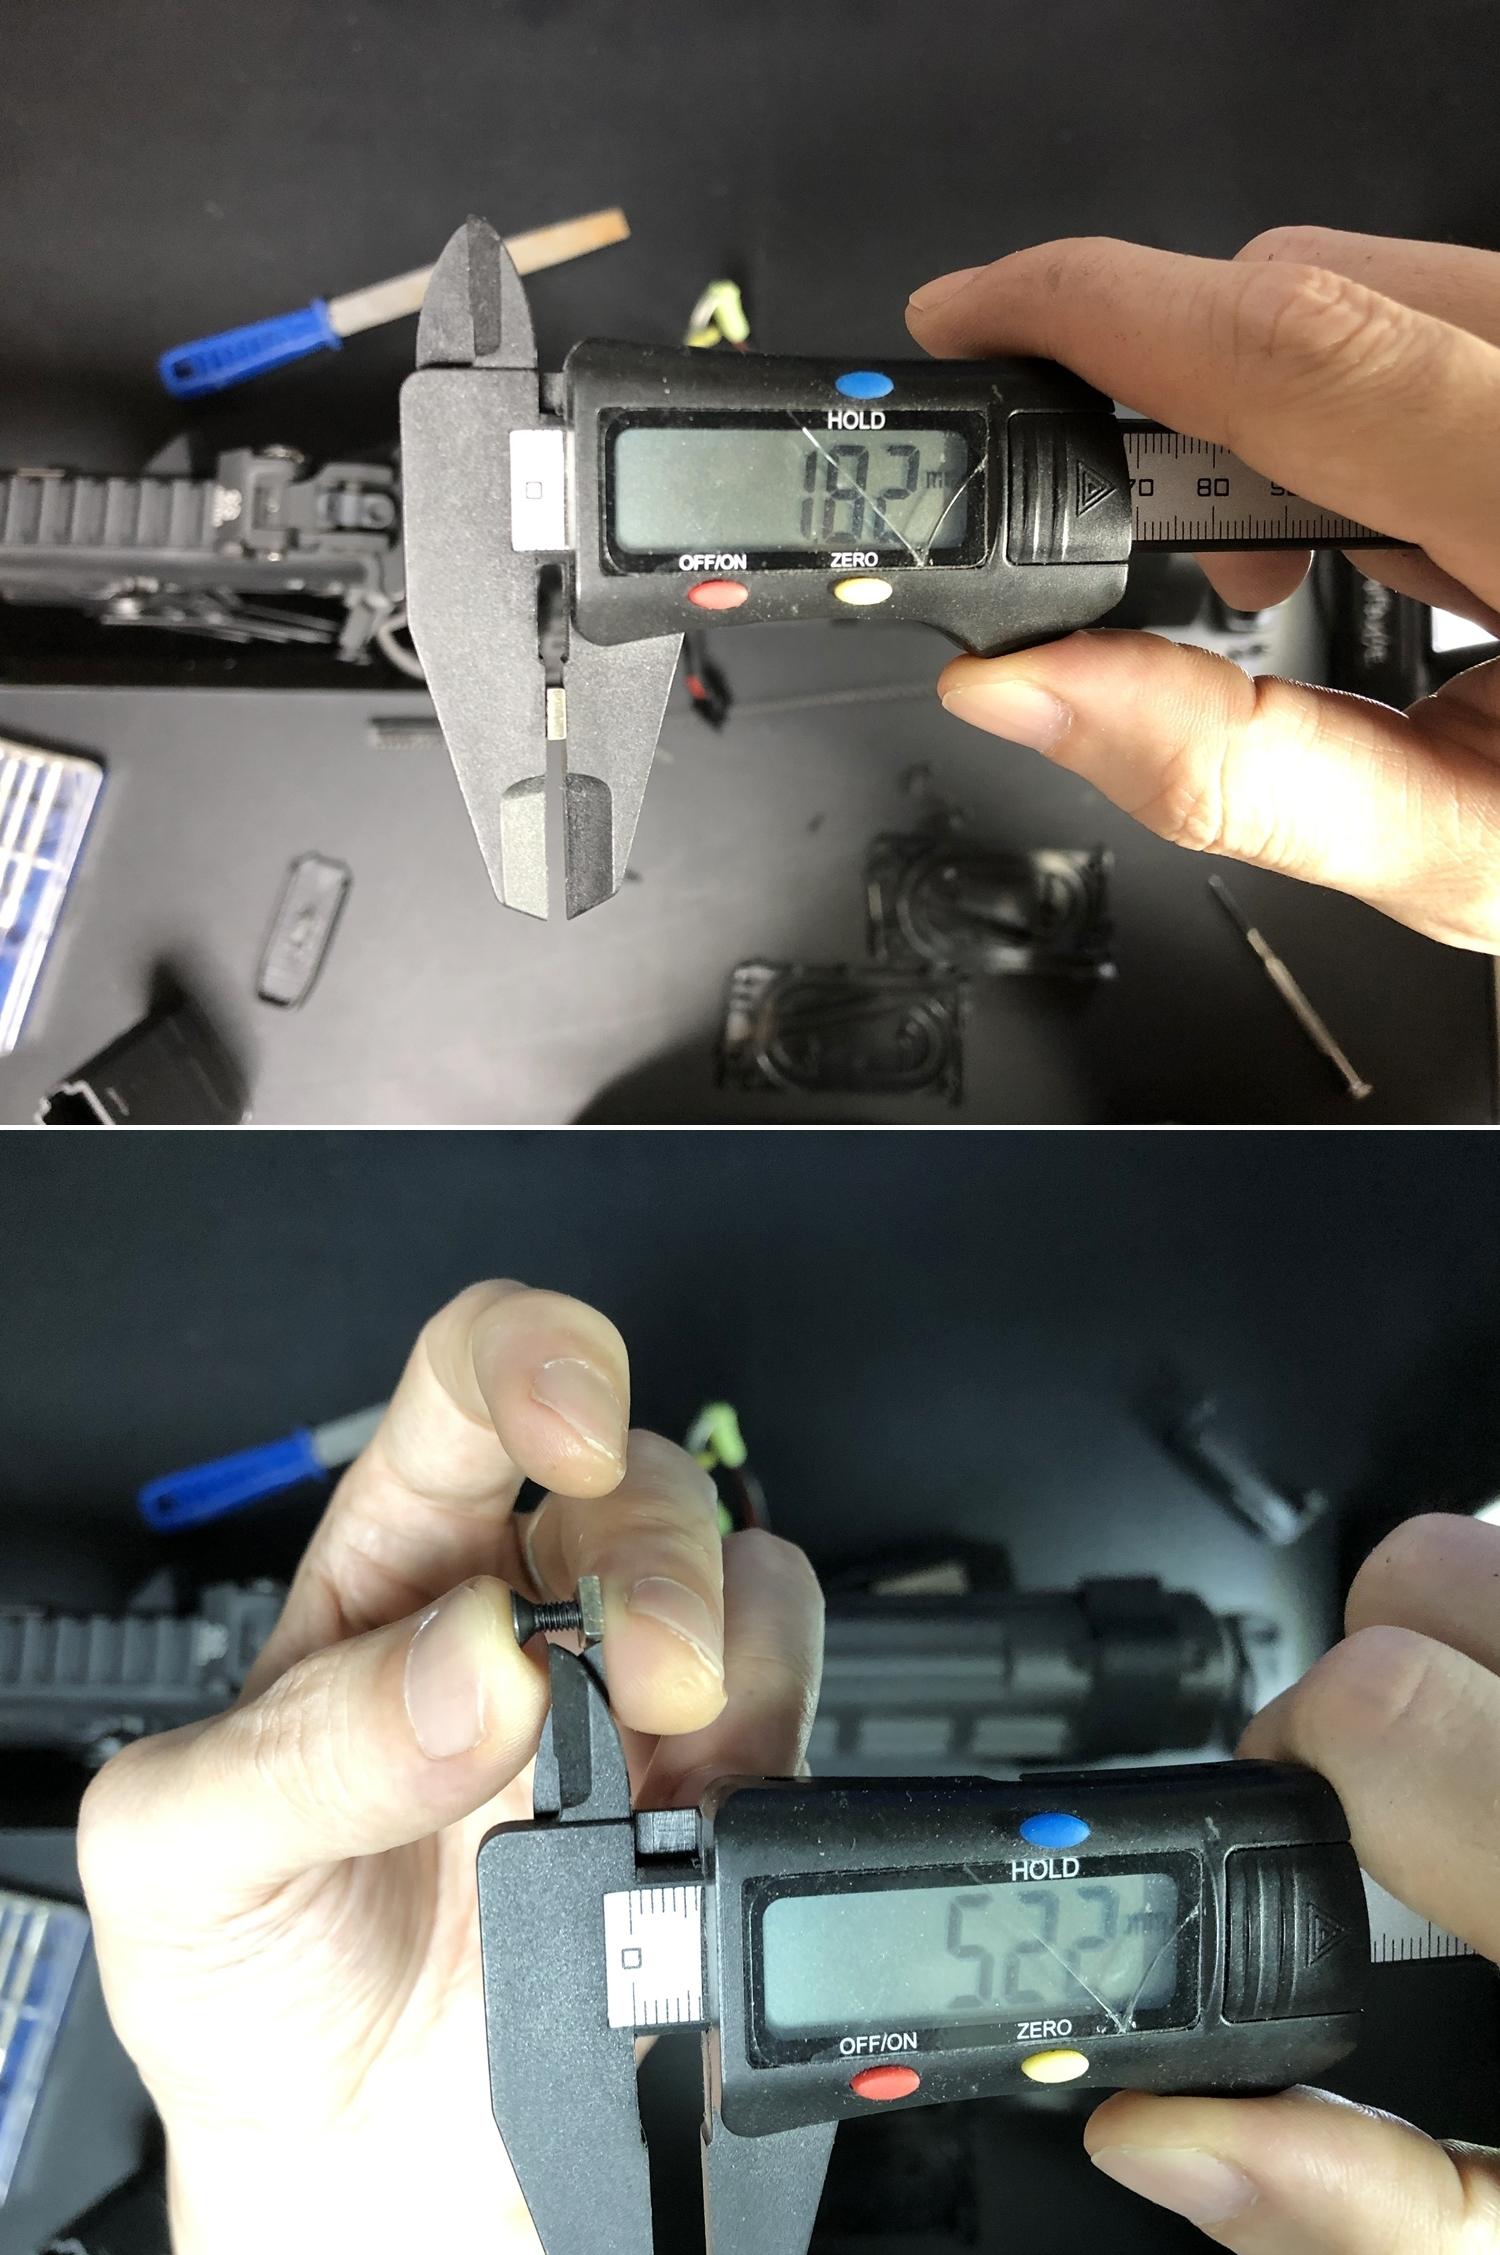 11 M4 P-MAG 20 ショートマガジン DIY 改造 外付け計画 第2弾 リポ バッテリーケース!! 実物 SB TACTICAL SBM4 SB-MAG20 へ装着だ!! 購入 改造 DIY 取付 レビュー!!